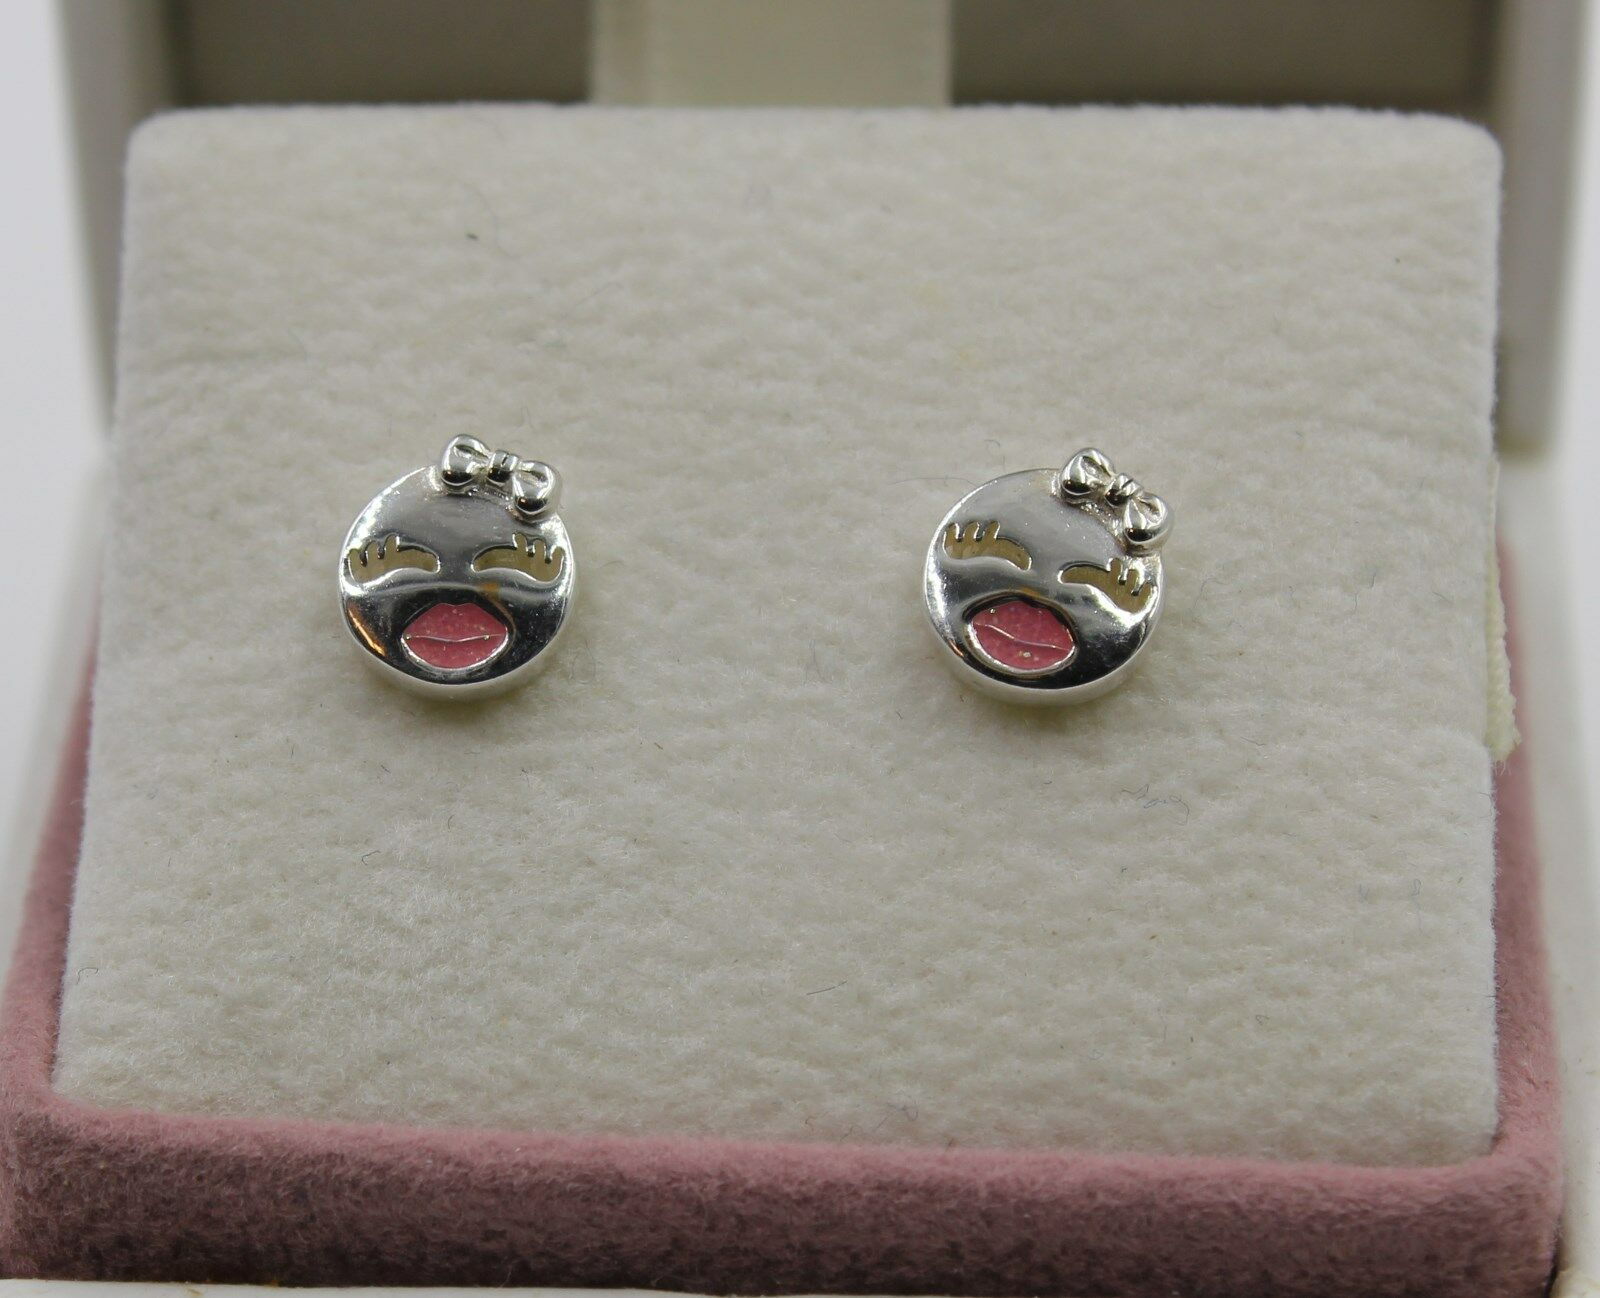 AUTHENTIC PANDORA Playful Wink Stud Earrings 297102EN161 1417 - $19.96